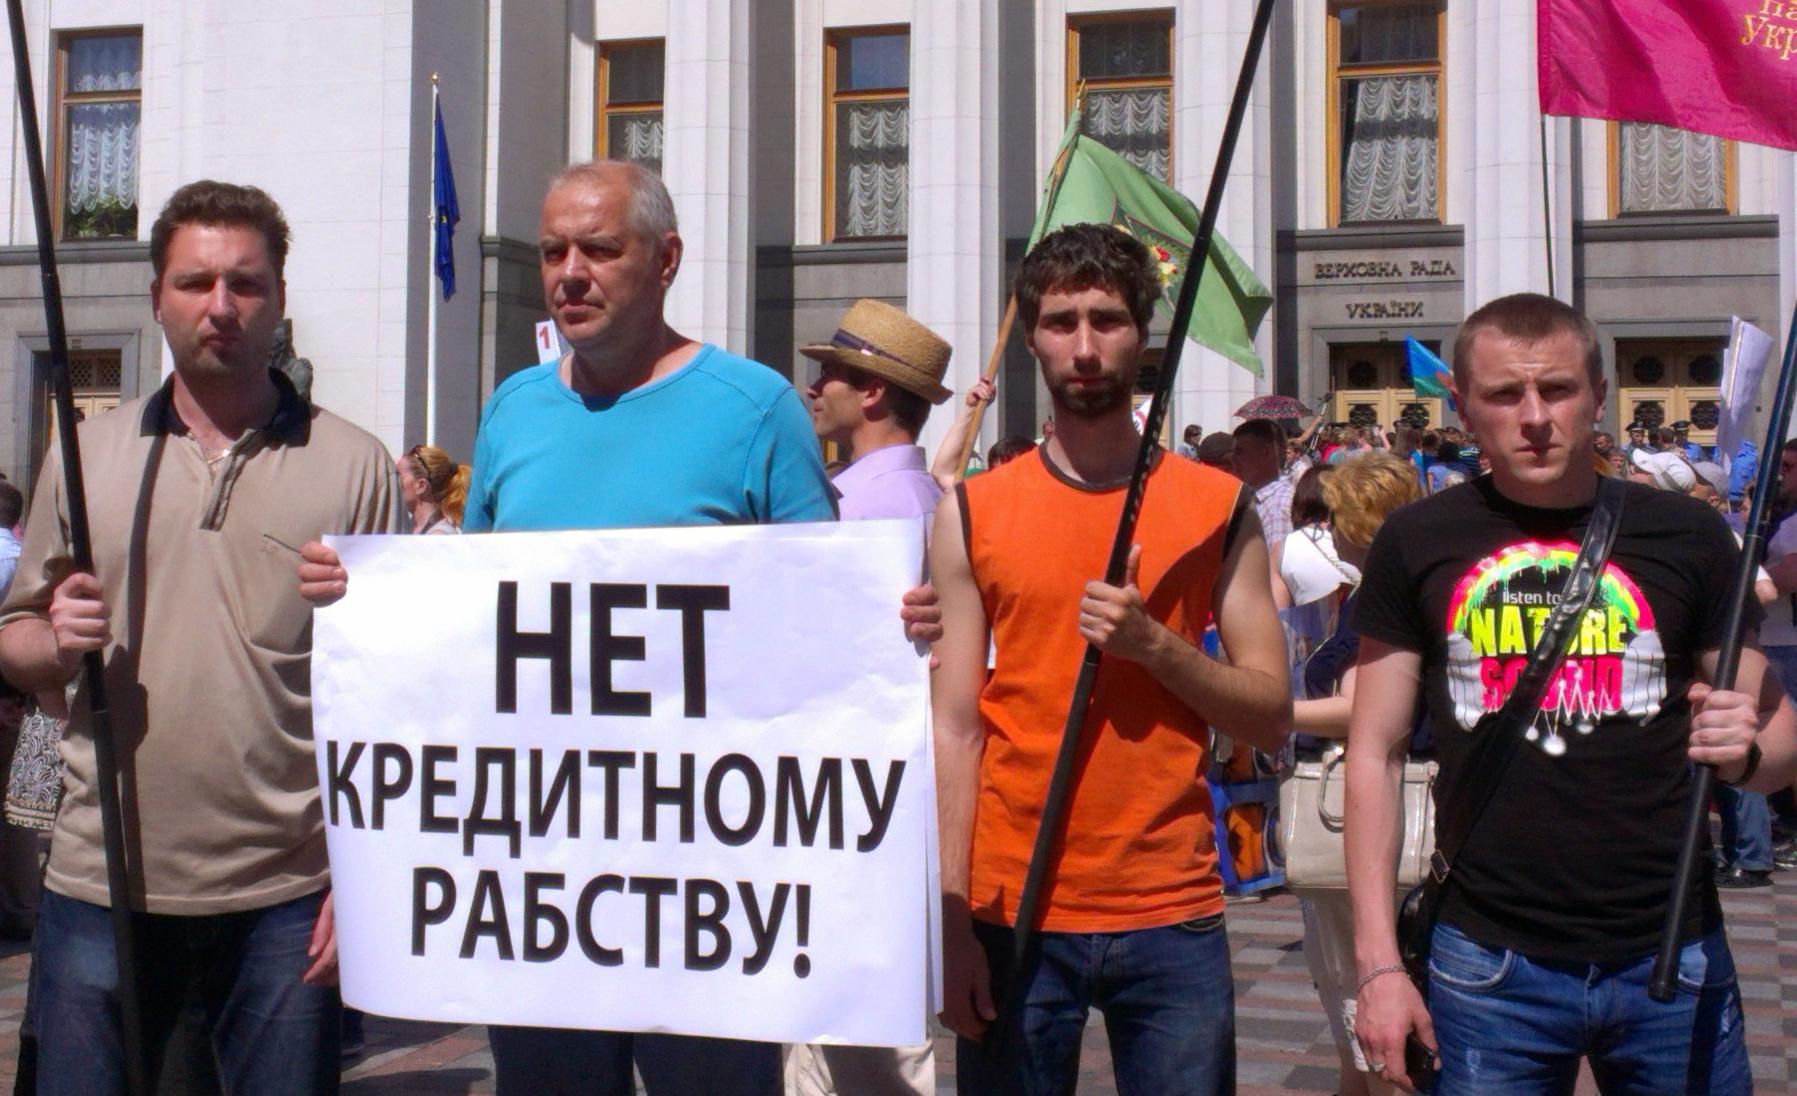 Заявки на кредит во все банки без справок и поручителей онлайн заявка смоленск